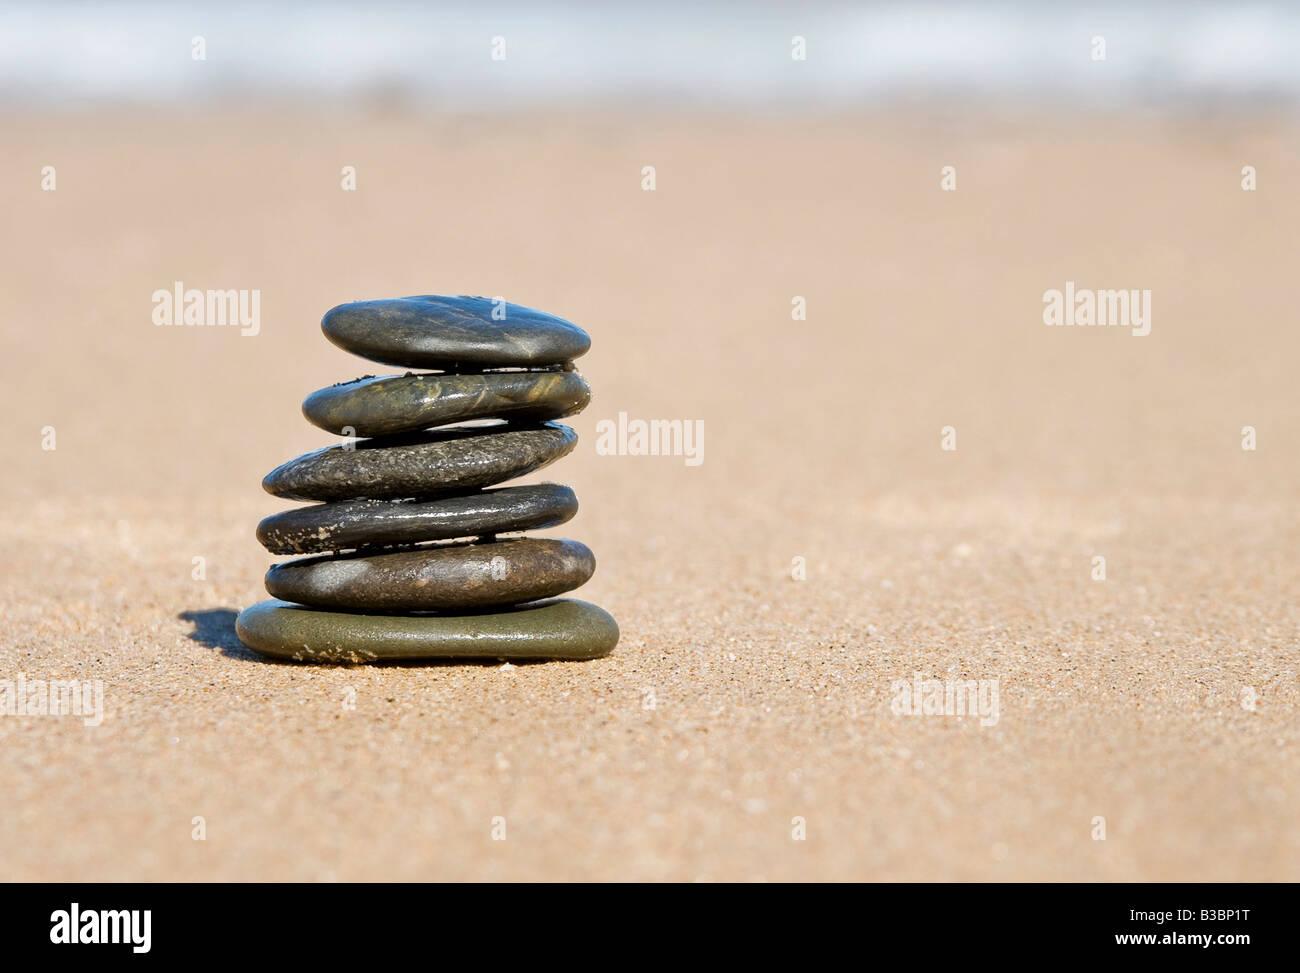 nice balancing stones representing stability and balance - Stock Image